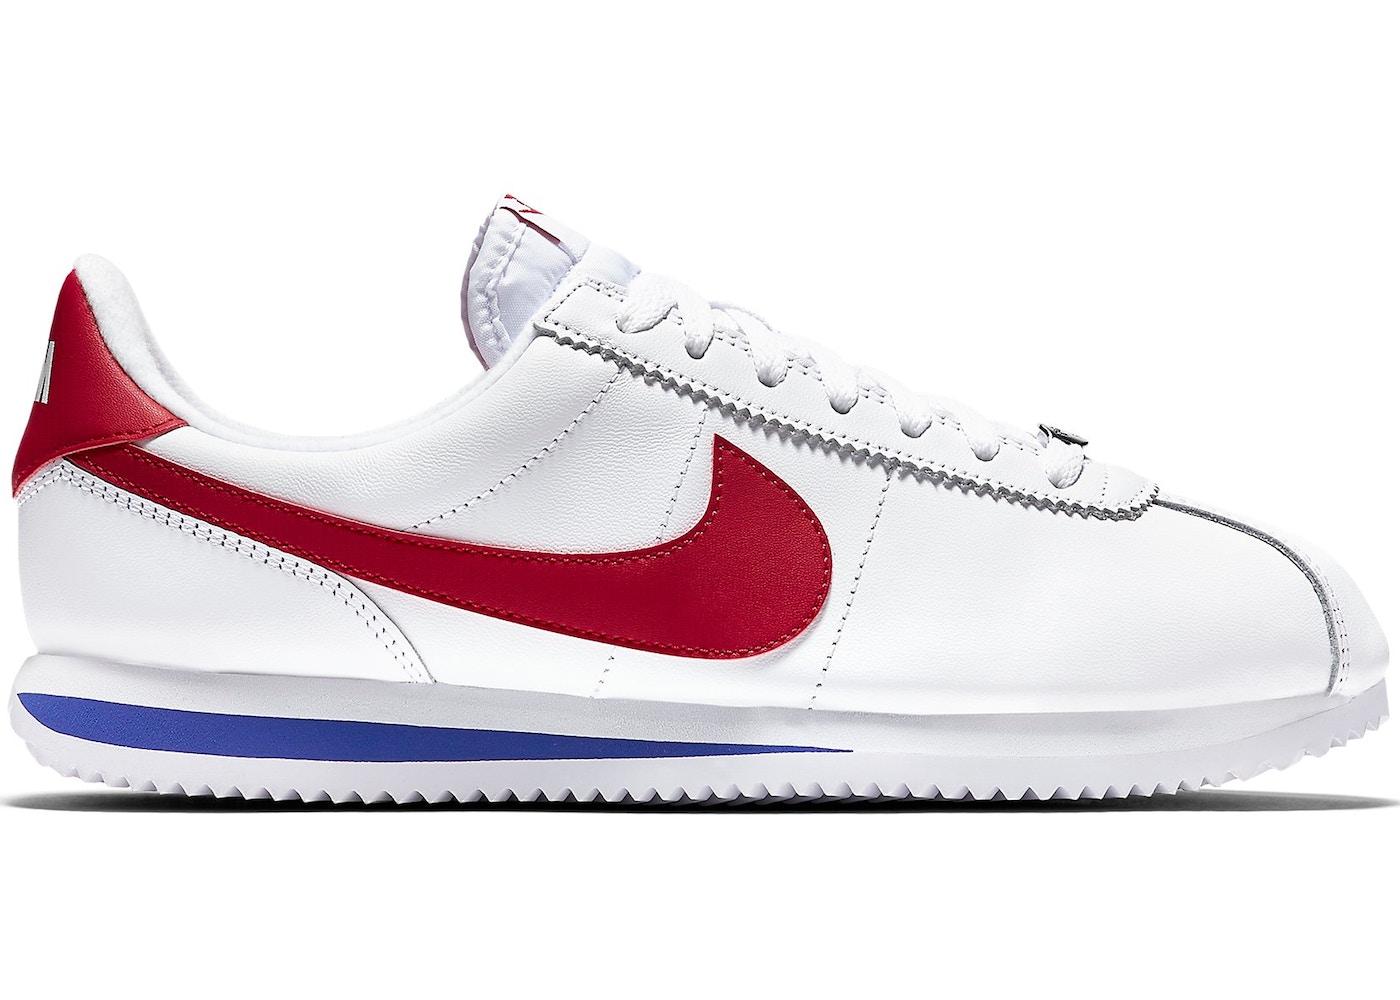 Forrest Gump Nike Shoes For Sale